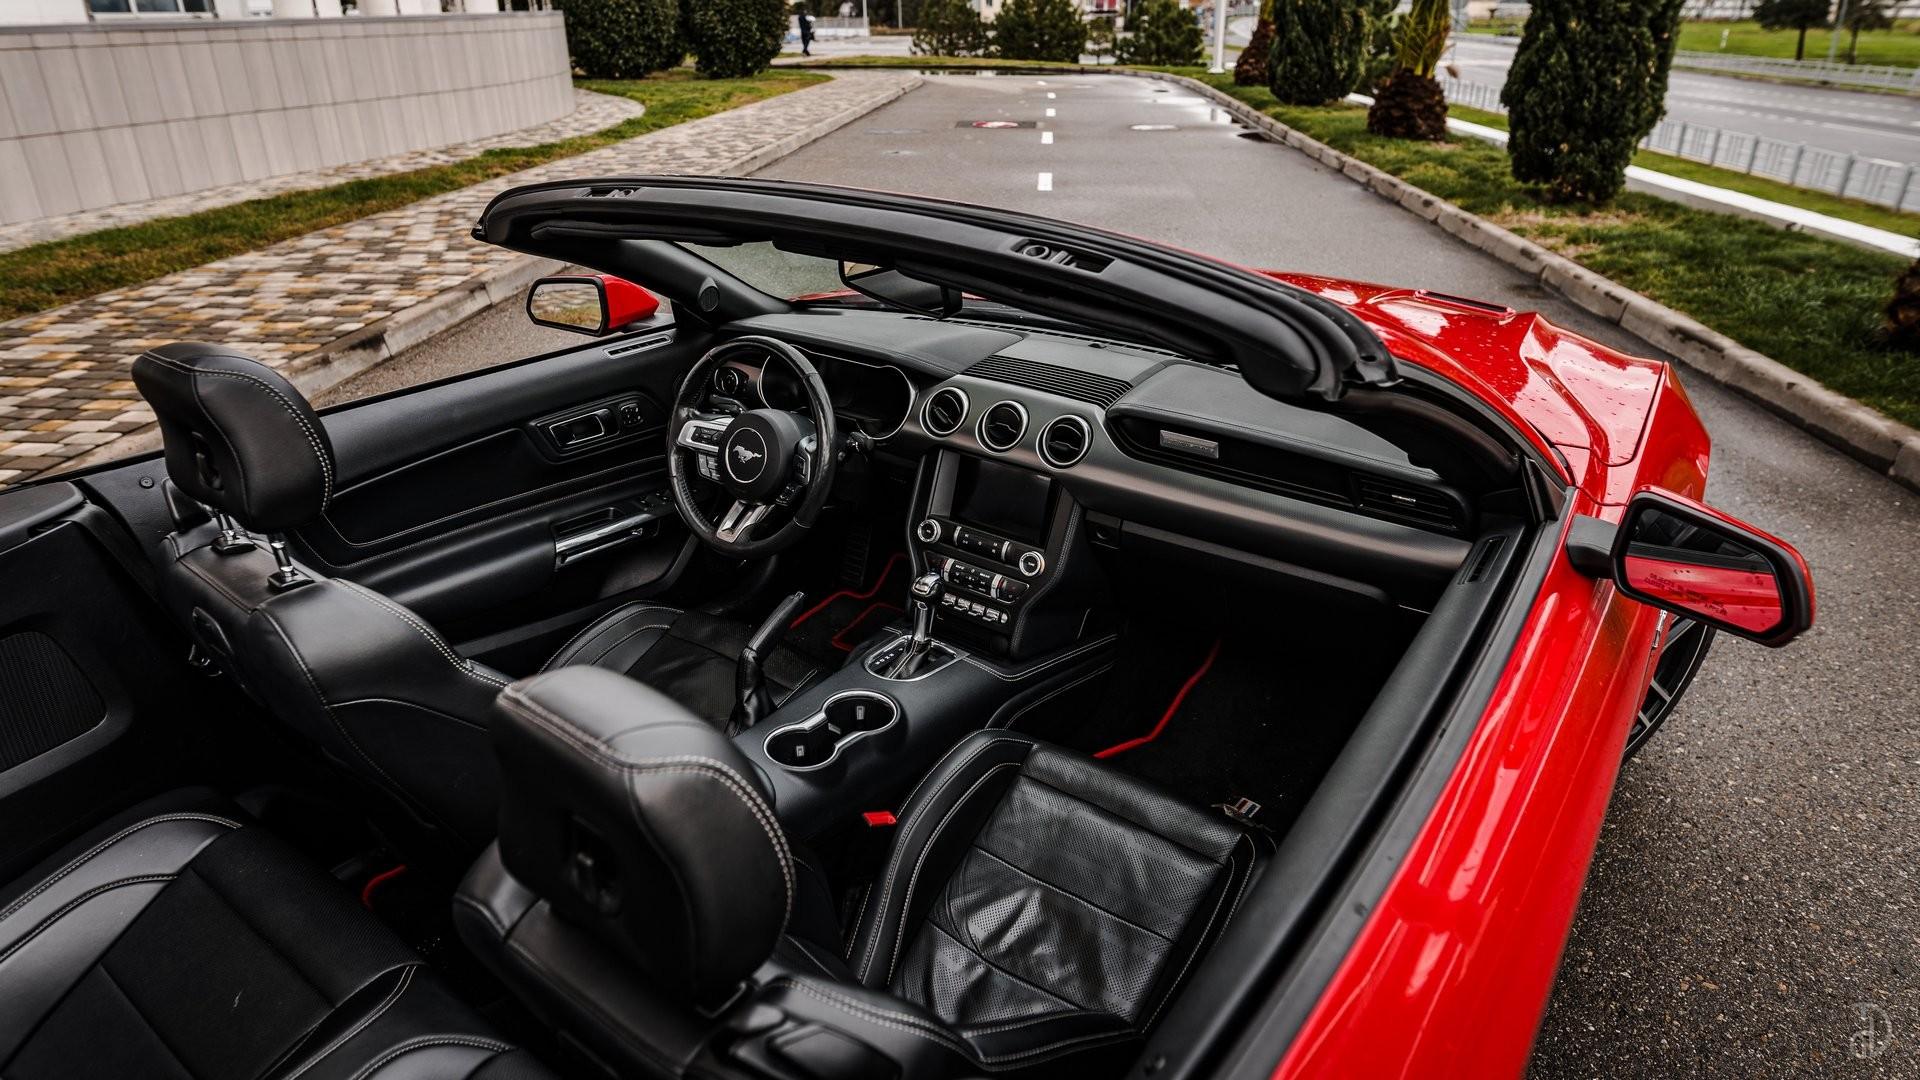 Аренда Ford Mustang GT 5.0 в Сочи. Фото 7